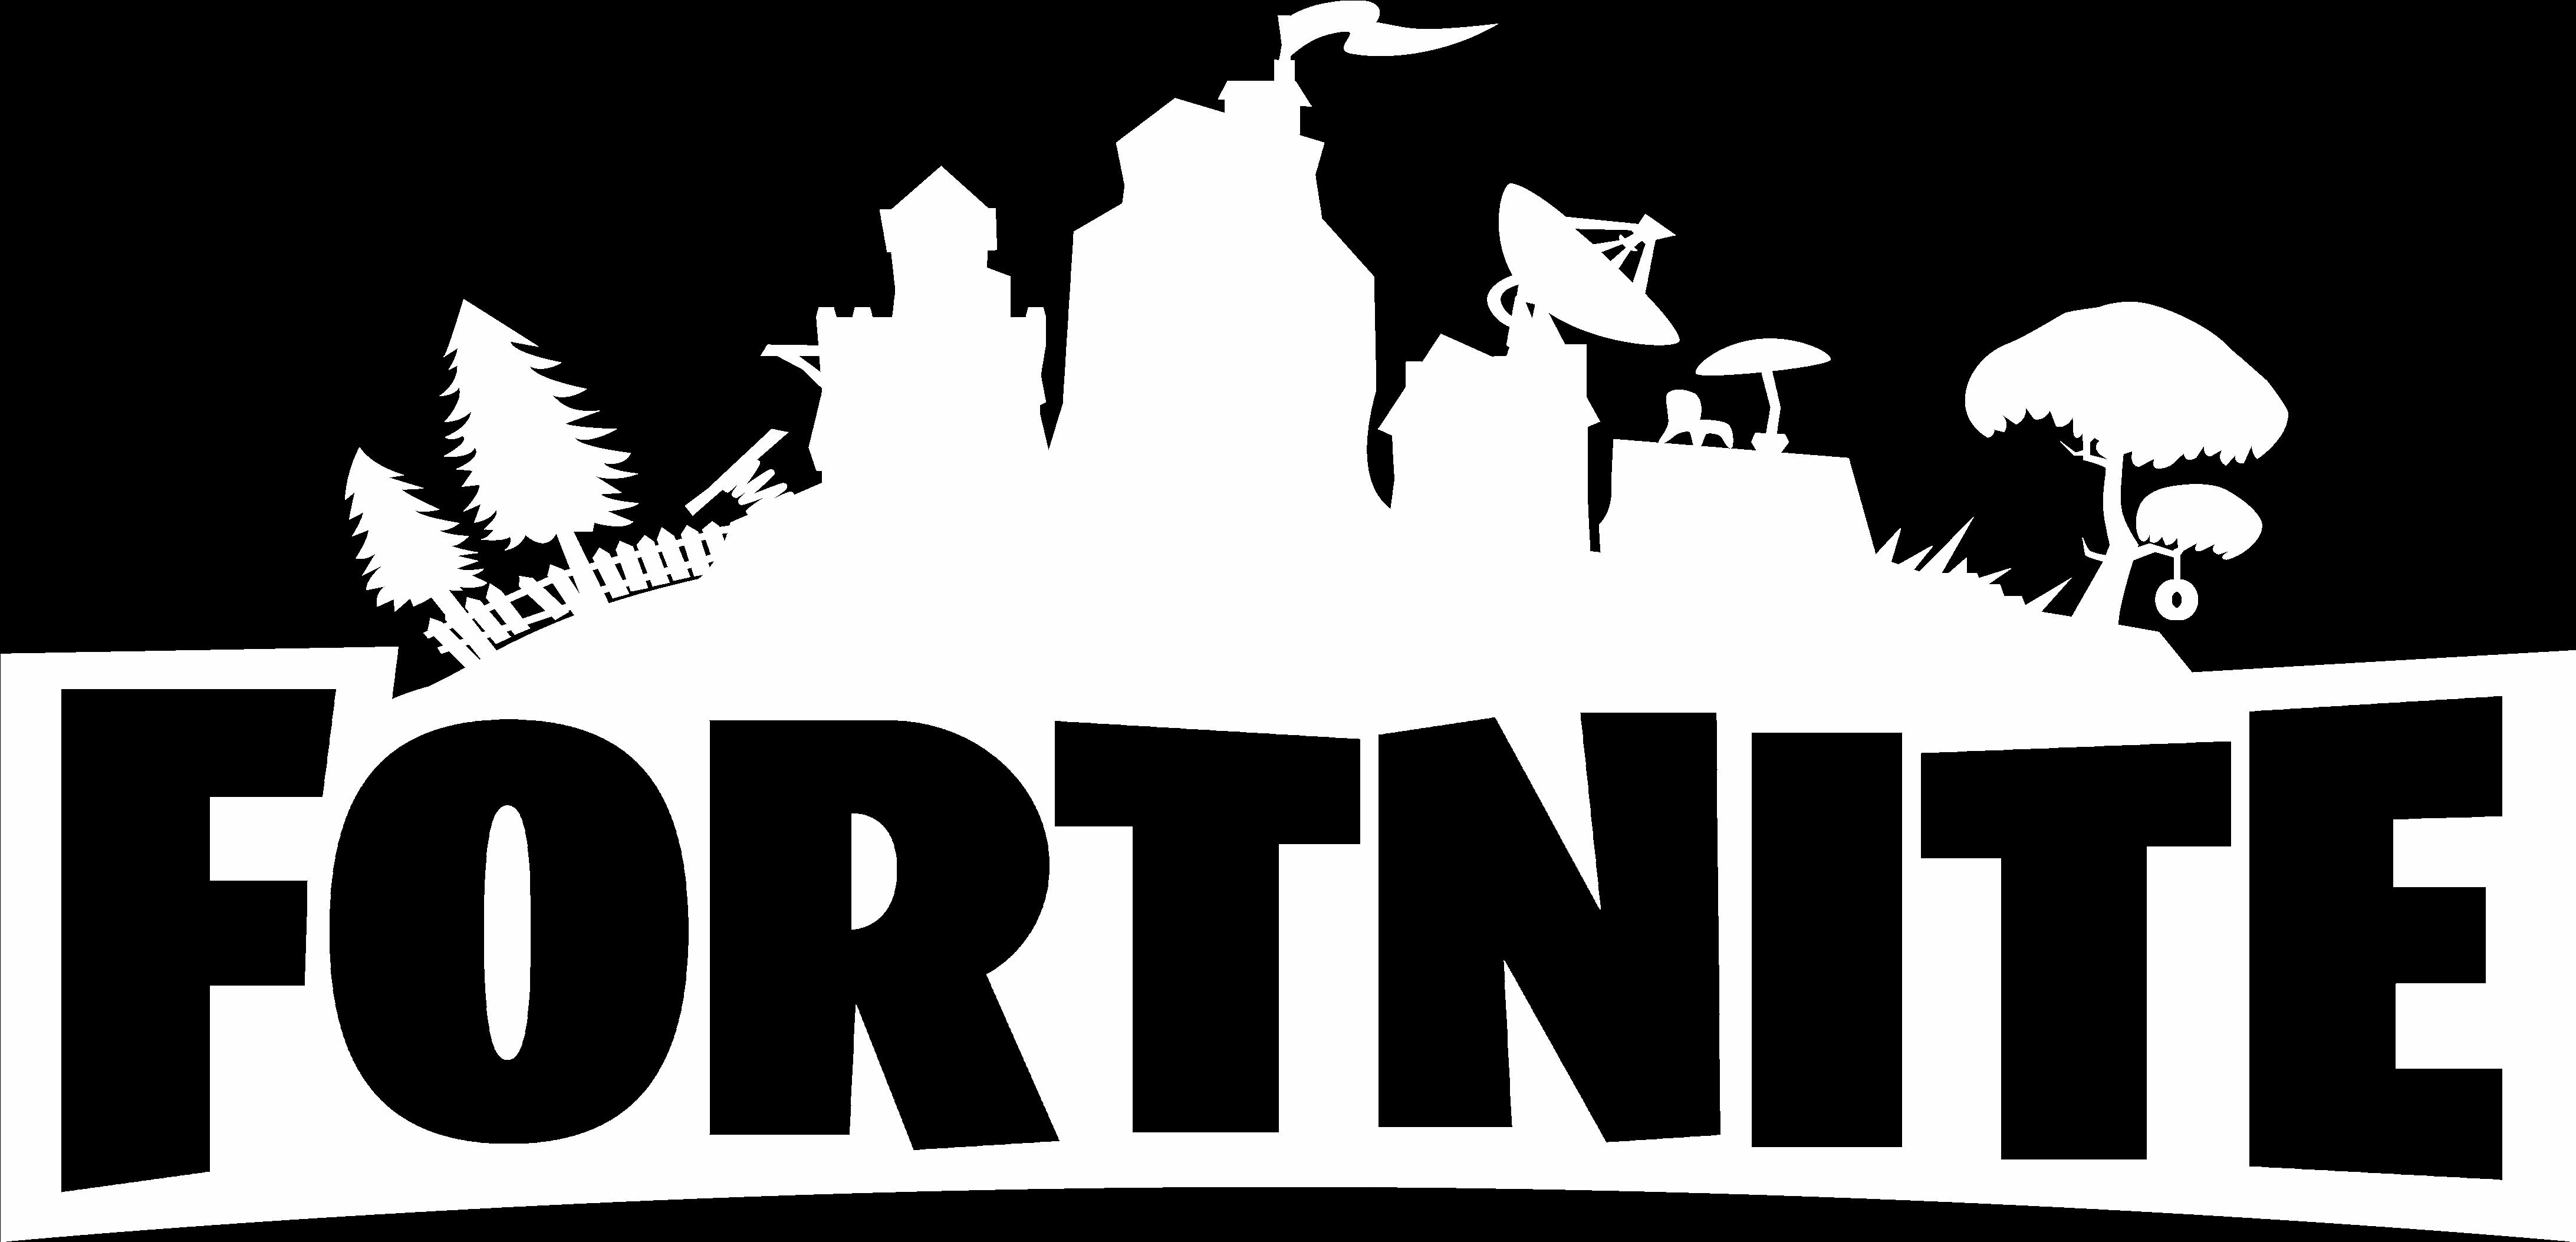 HD Fortnite Battle Royale Teespring.